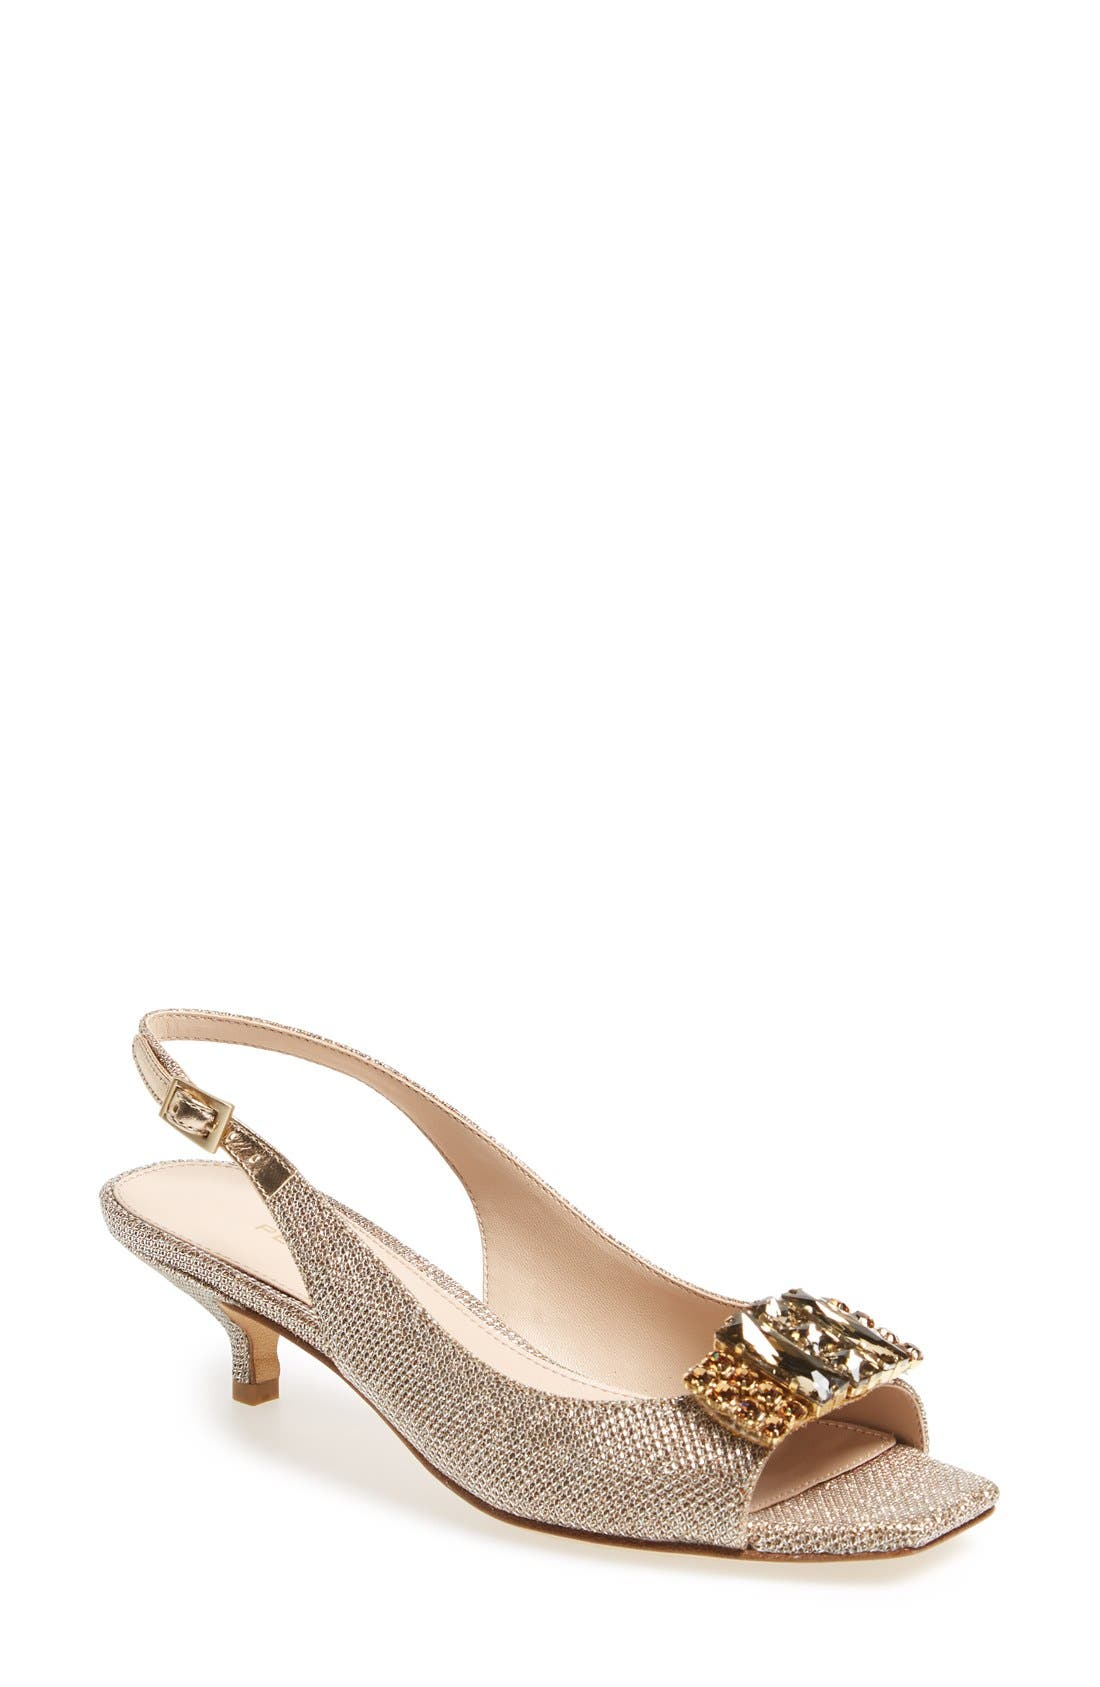 Main Image - Pelle Moda 'Fresh' Jeweled Metallic Leather Slingback Sandal (Women)